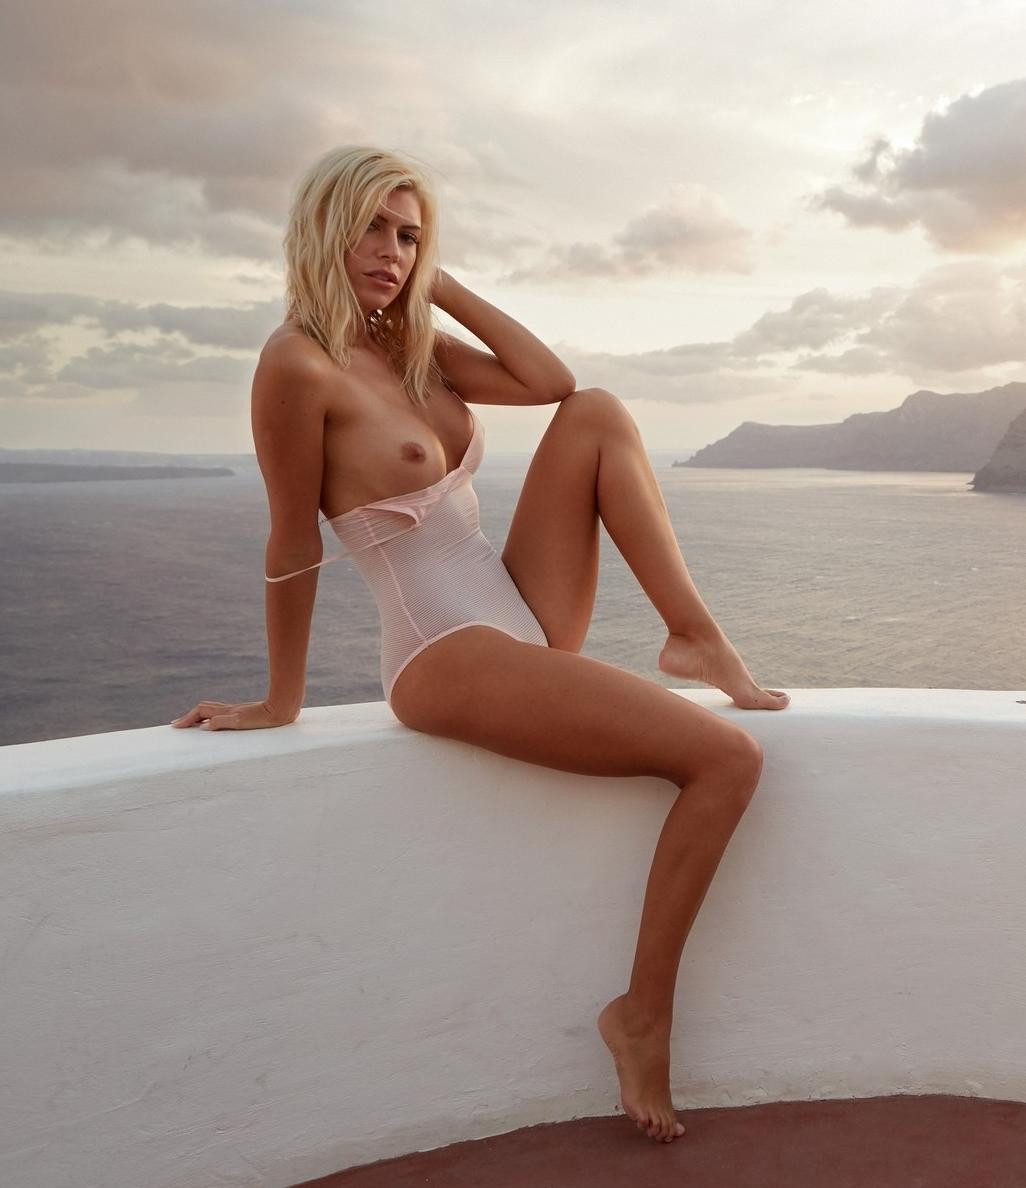 Naked Tanja Brockmann nudes (21 foto and video), Sexy, Cleavage, Instagram, braless 2006